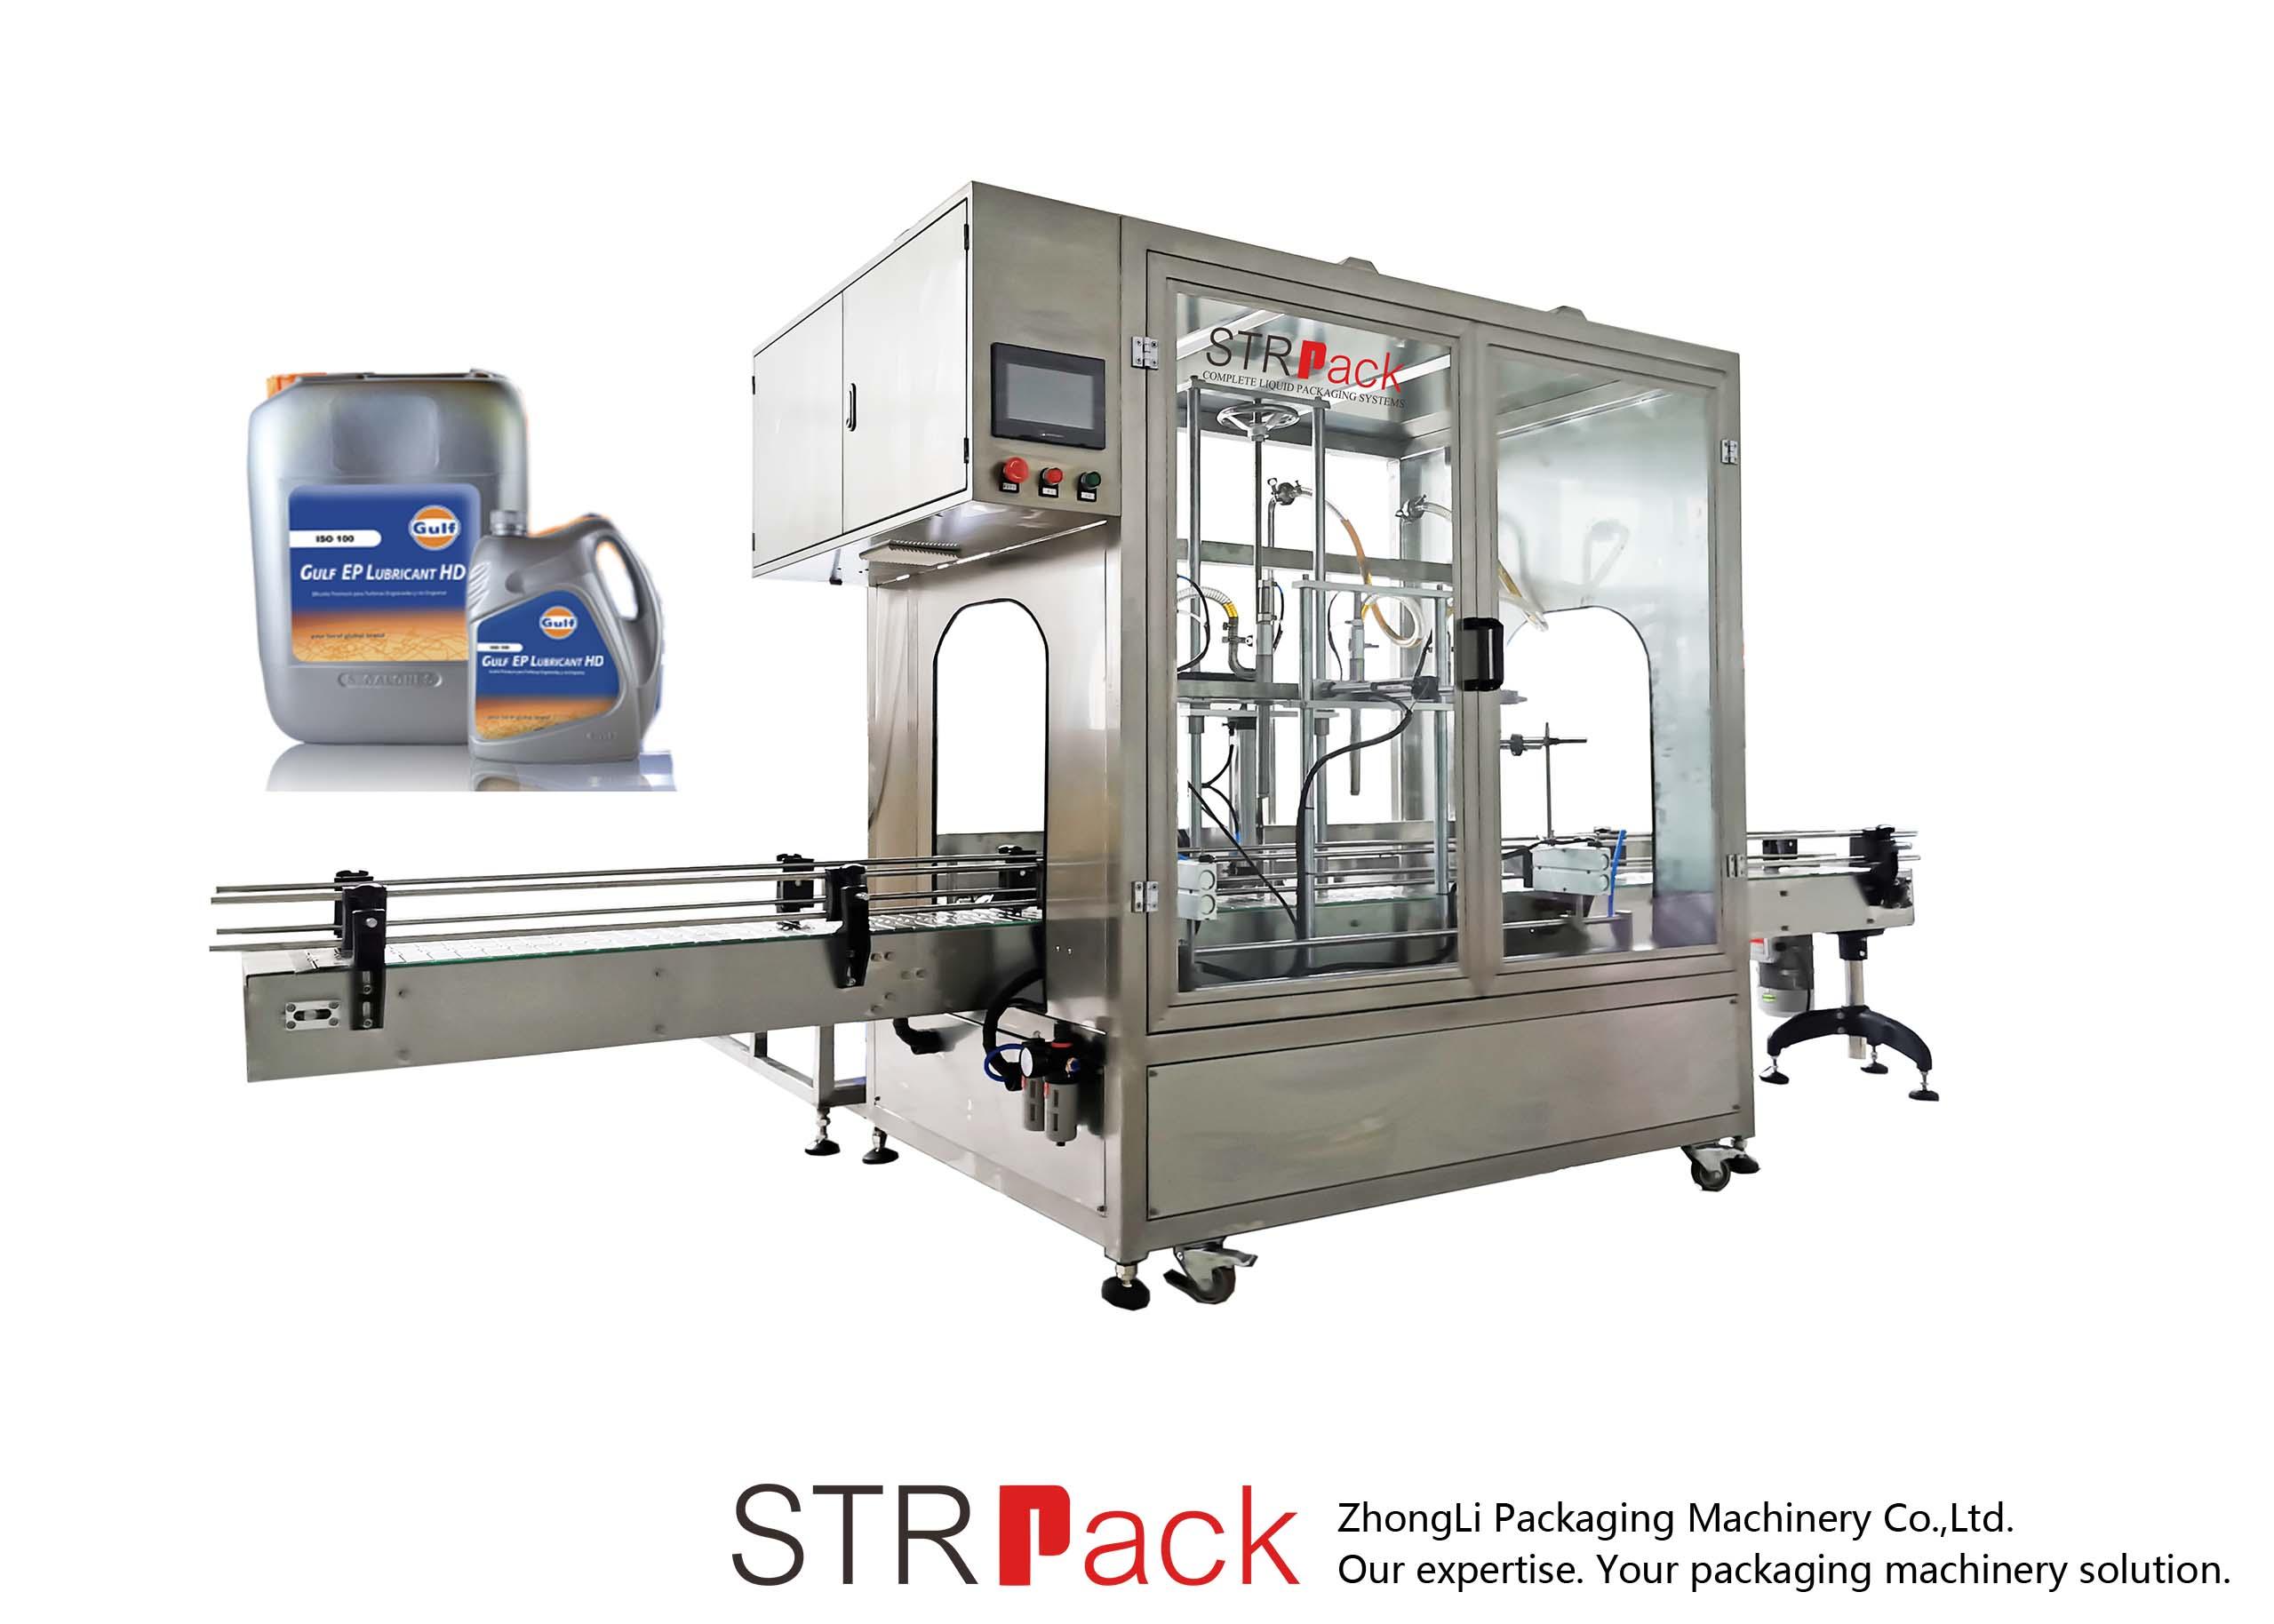 स्वचालित फ्लोमीटर भरने की मशीन